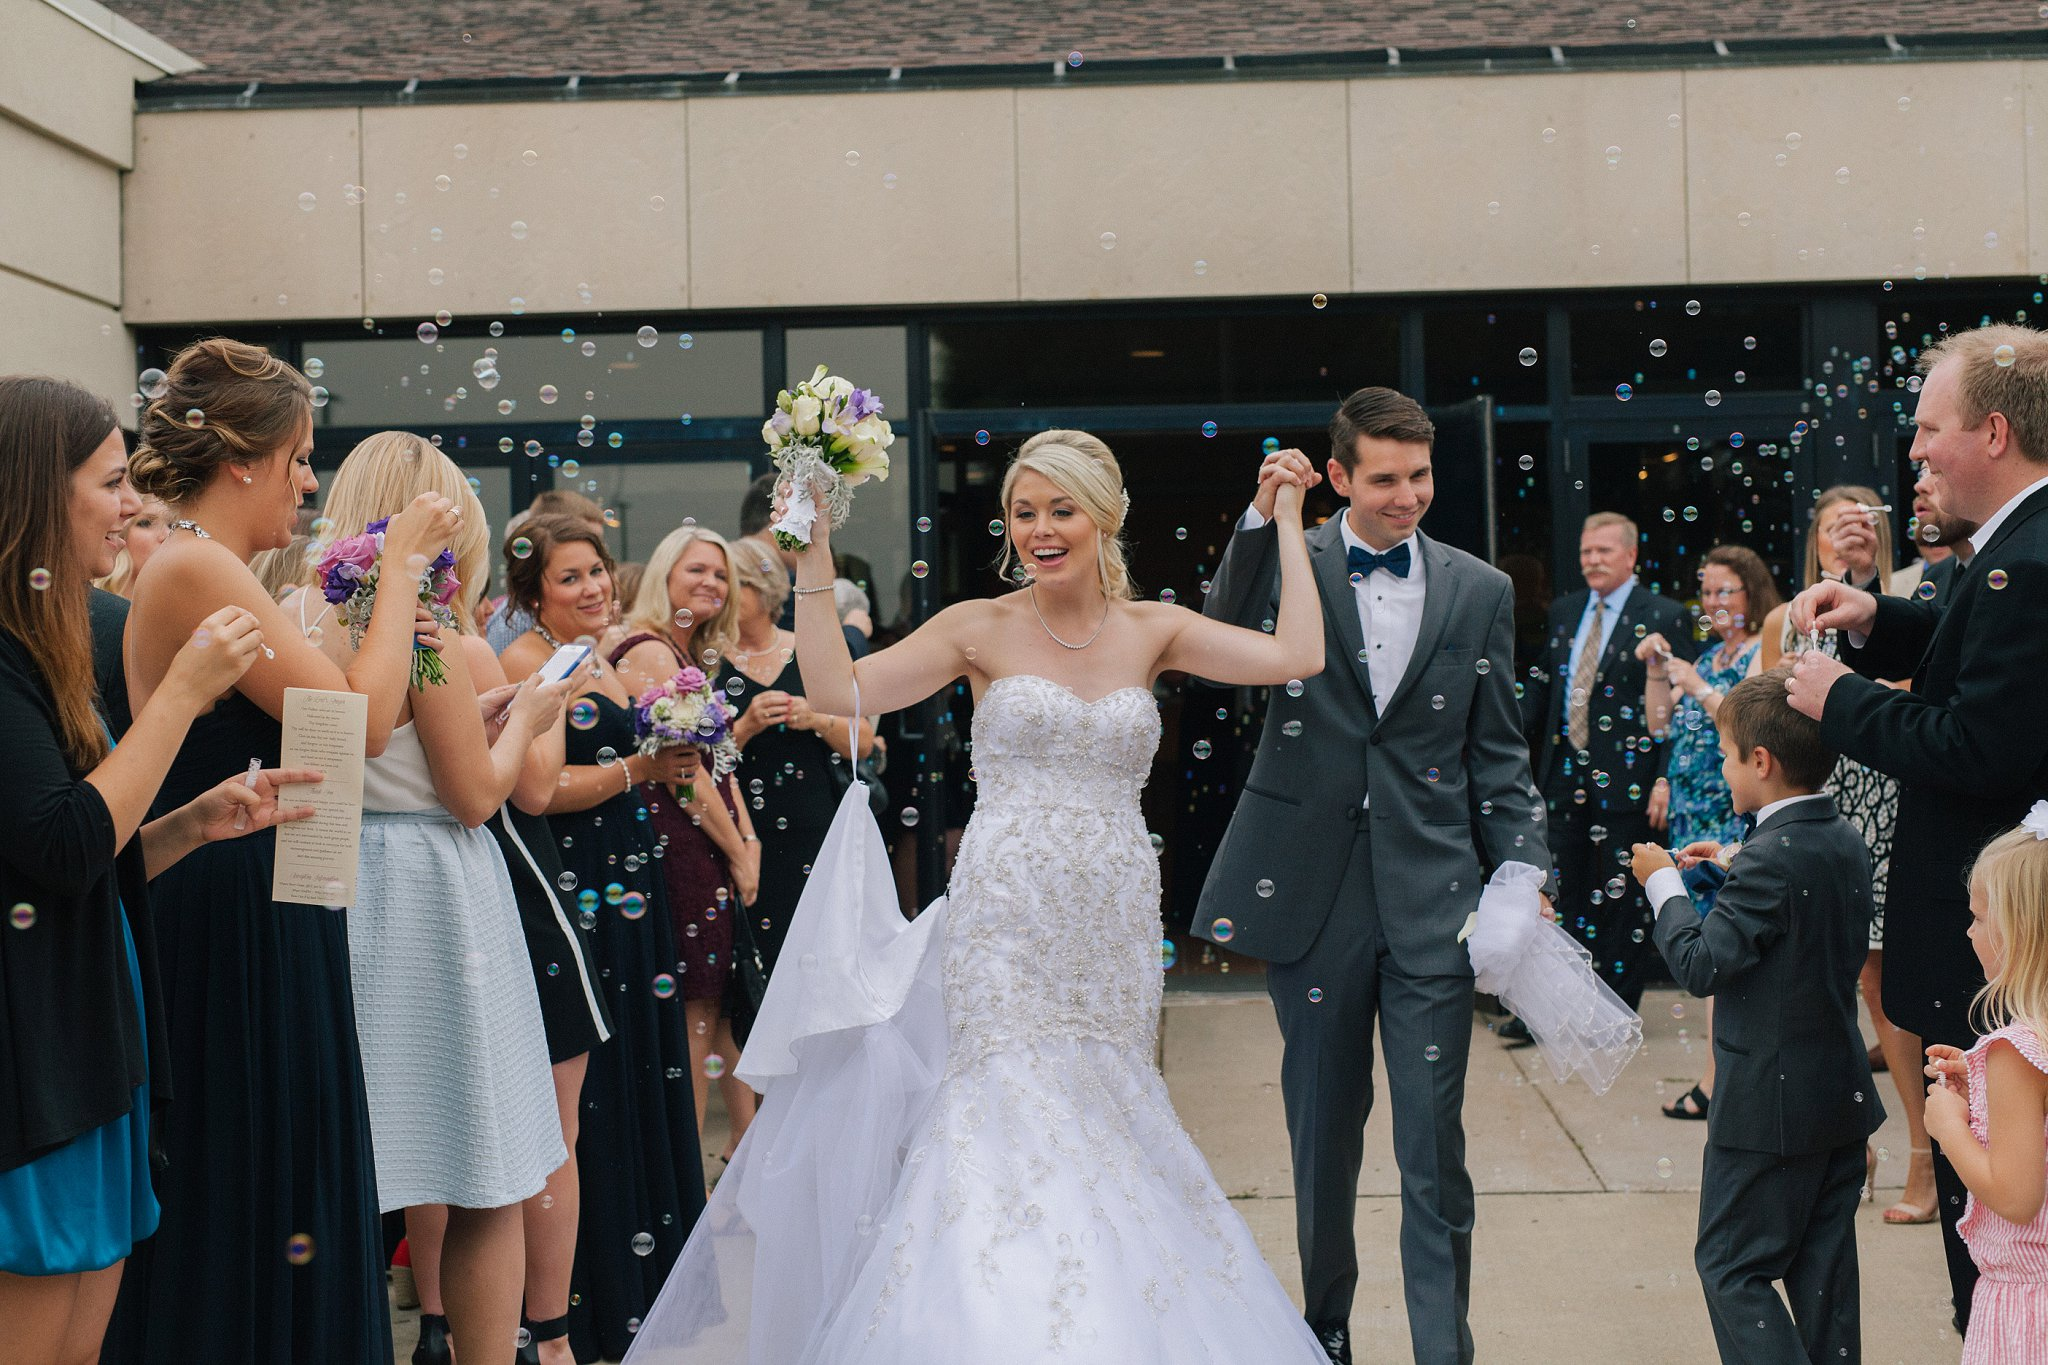 bride & groom bubble exit at St Ann's church Quad Cities